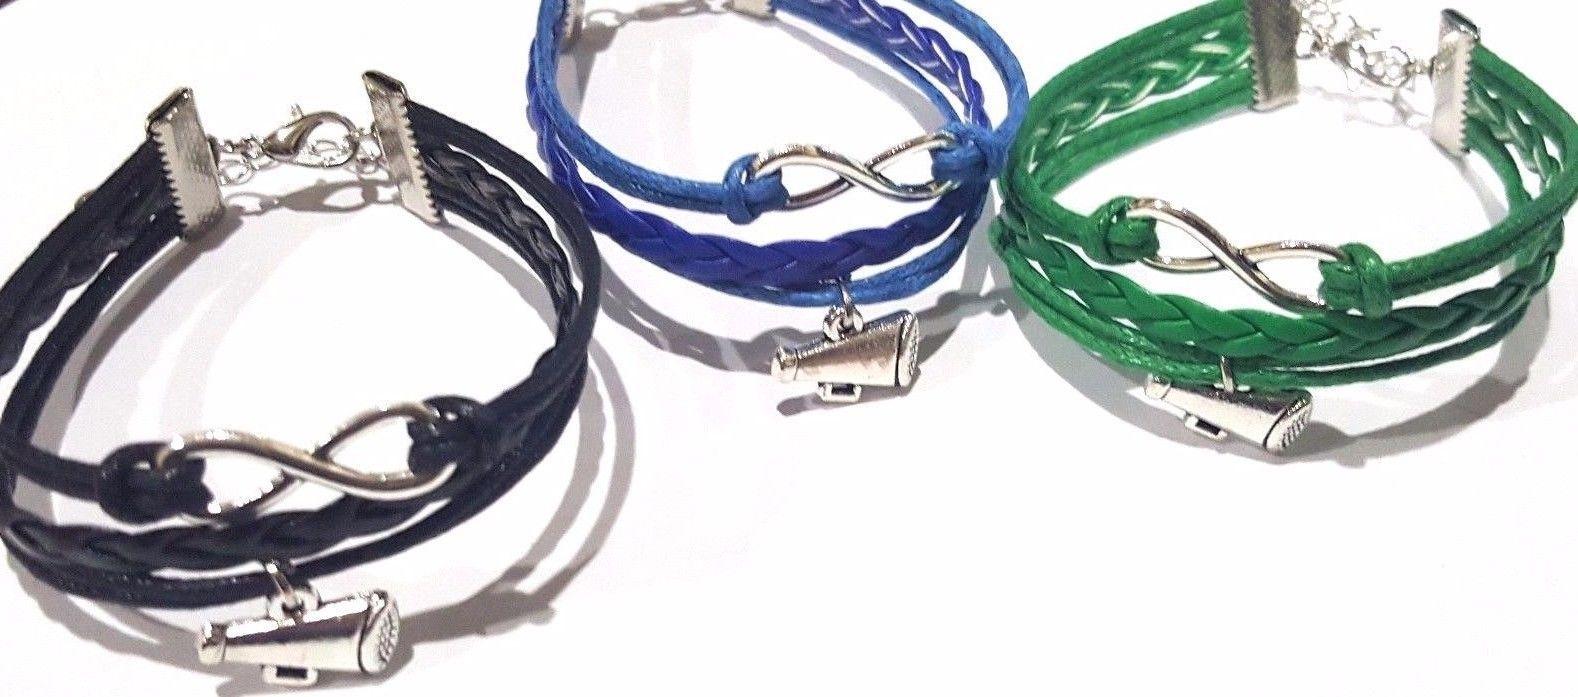 Infinity love #bracelet w megaphone #charm  / #cheerleader #cheer,  View more on the LINK: http://www.zeppy.io/product/gb/2/252319583723/